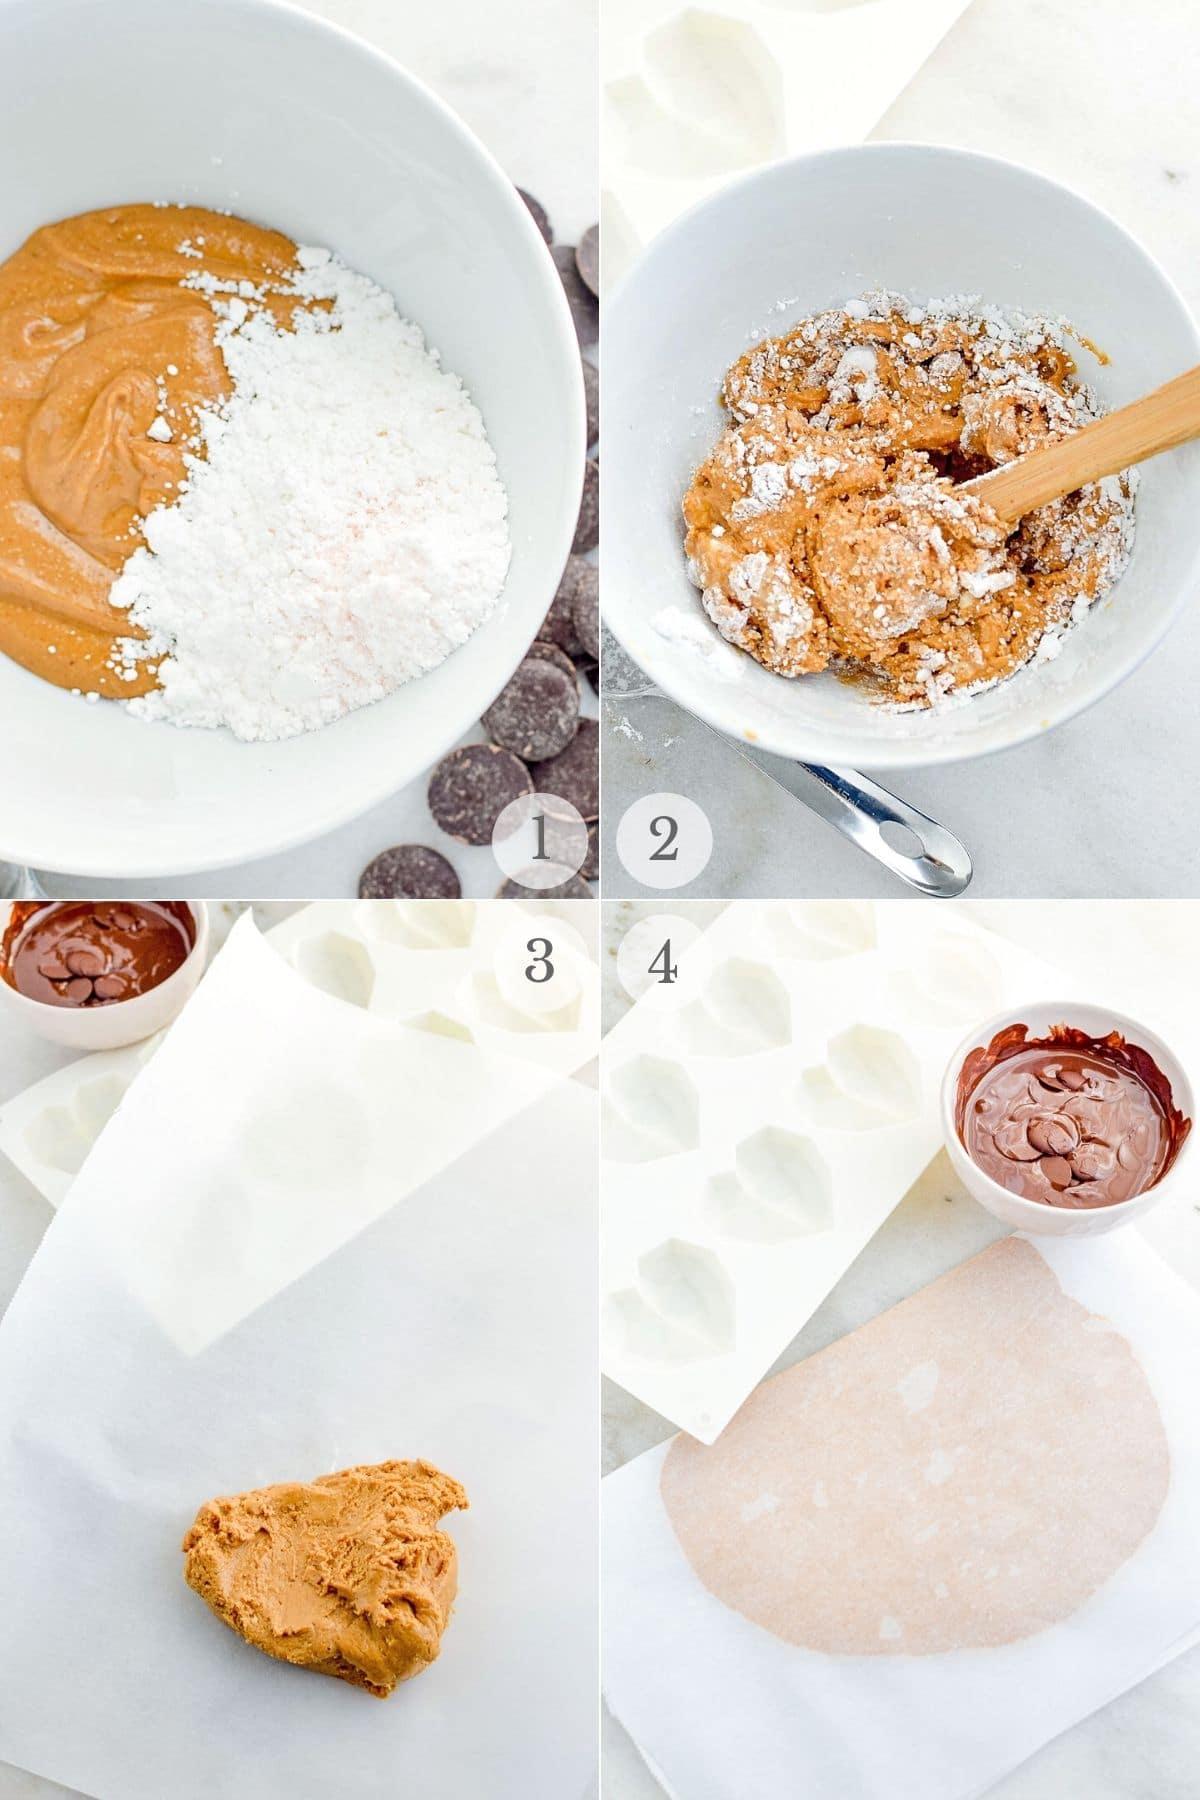 homemade peanut butter cups recipes steps 1-4